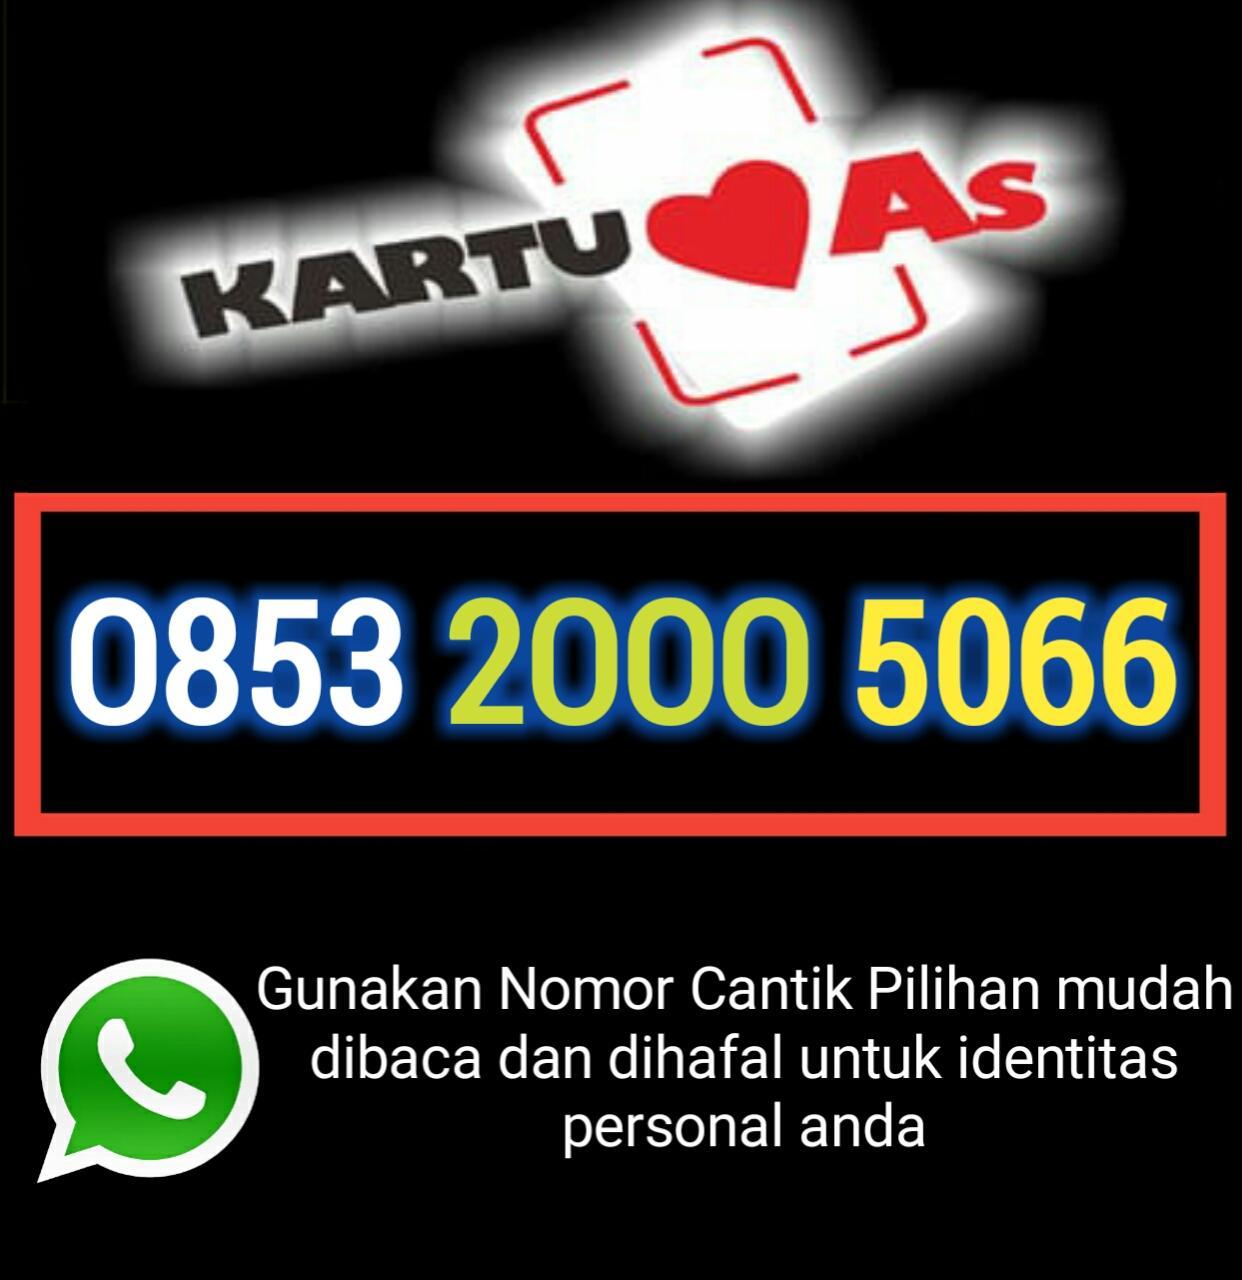 Nomor cantik Telkomsel 0853 2000 5066 kartu perdana as